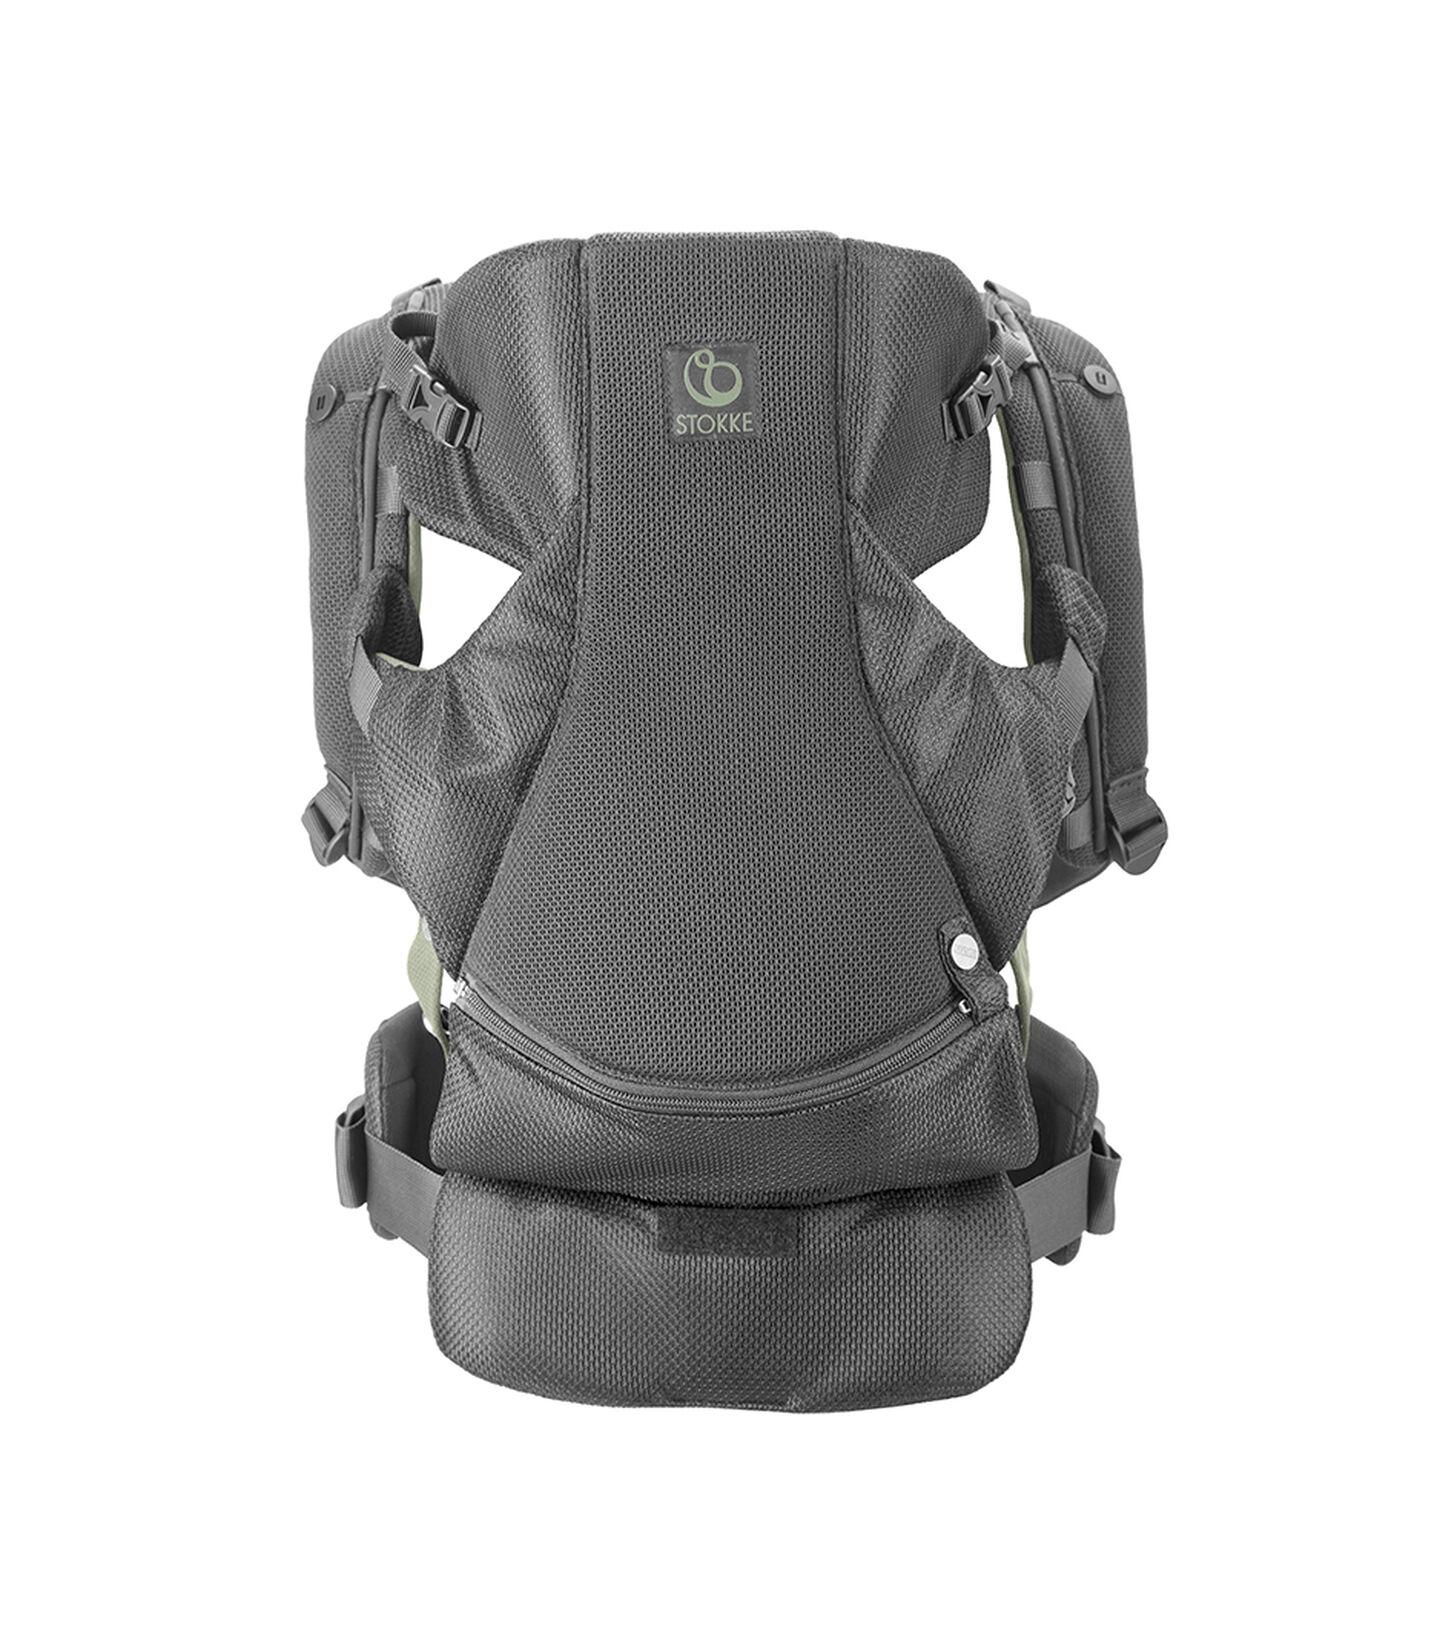 Stokke® MyCarrier™ Bauch- und Rückentrage in Green Mesh, Green Mesh, mainview view 2